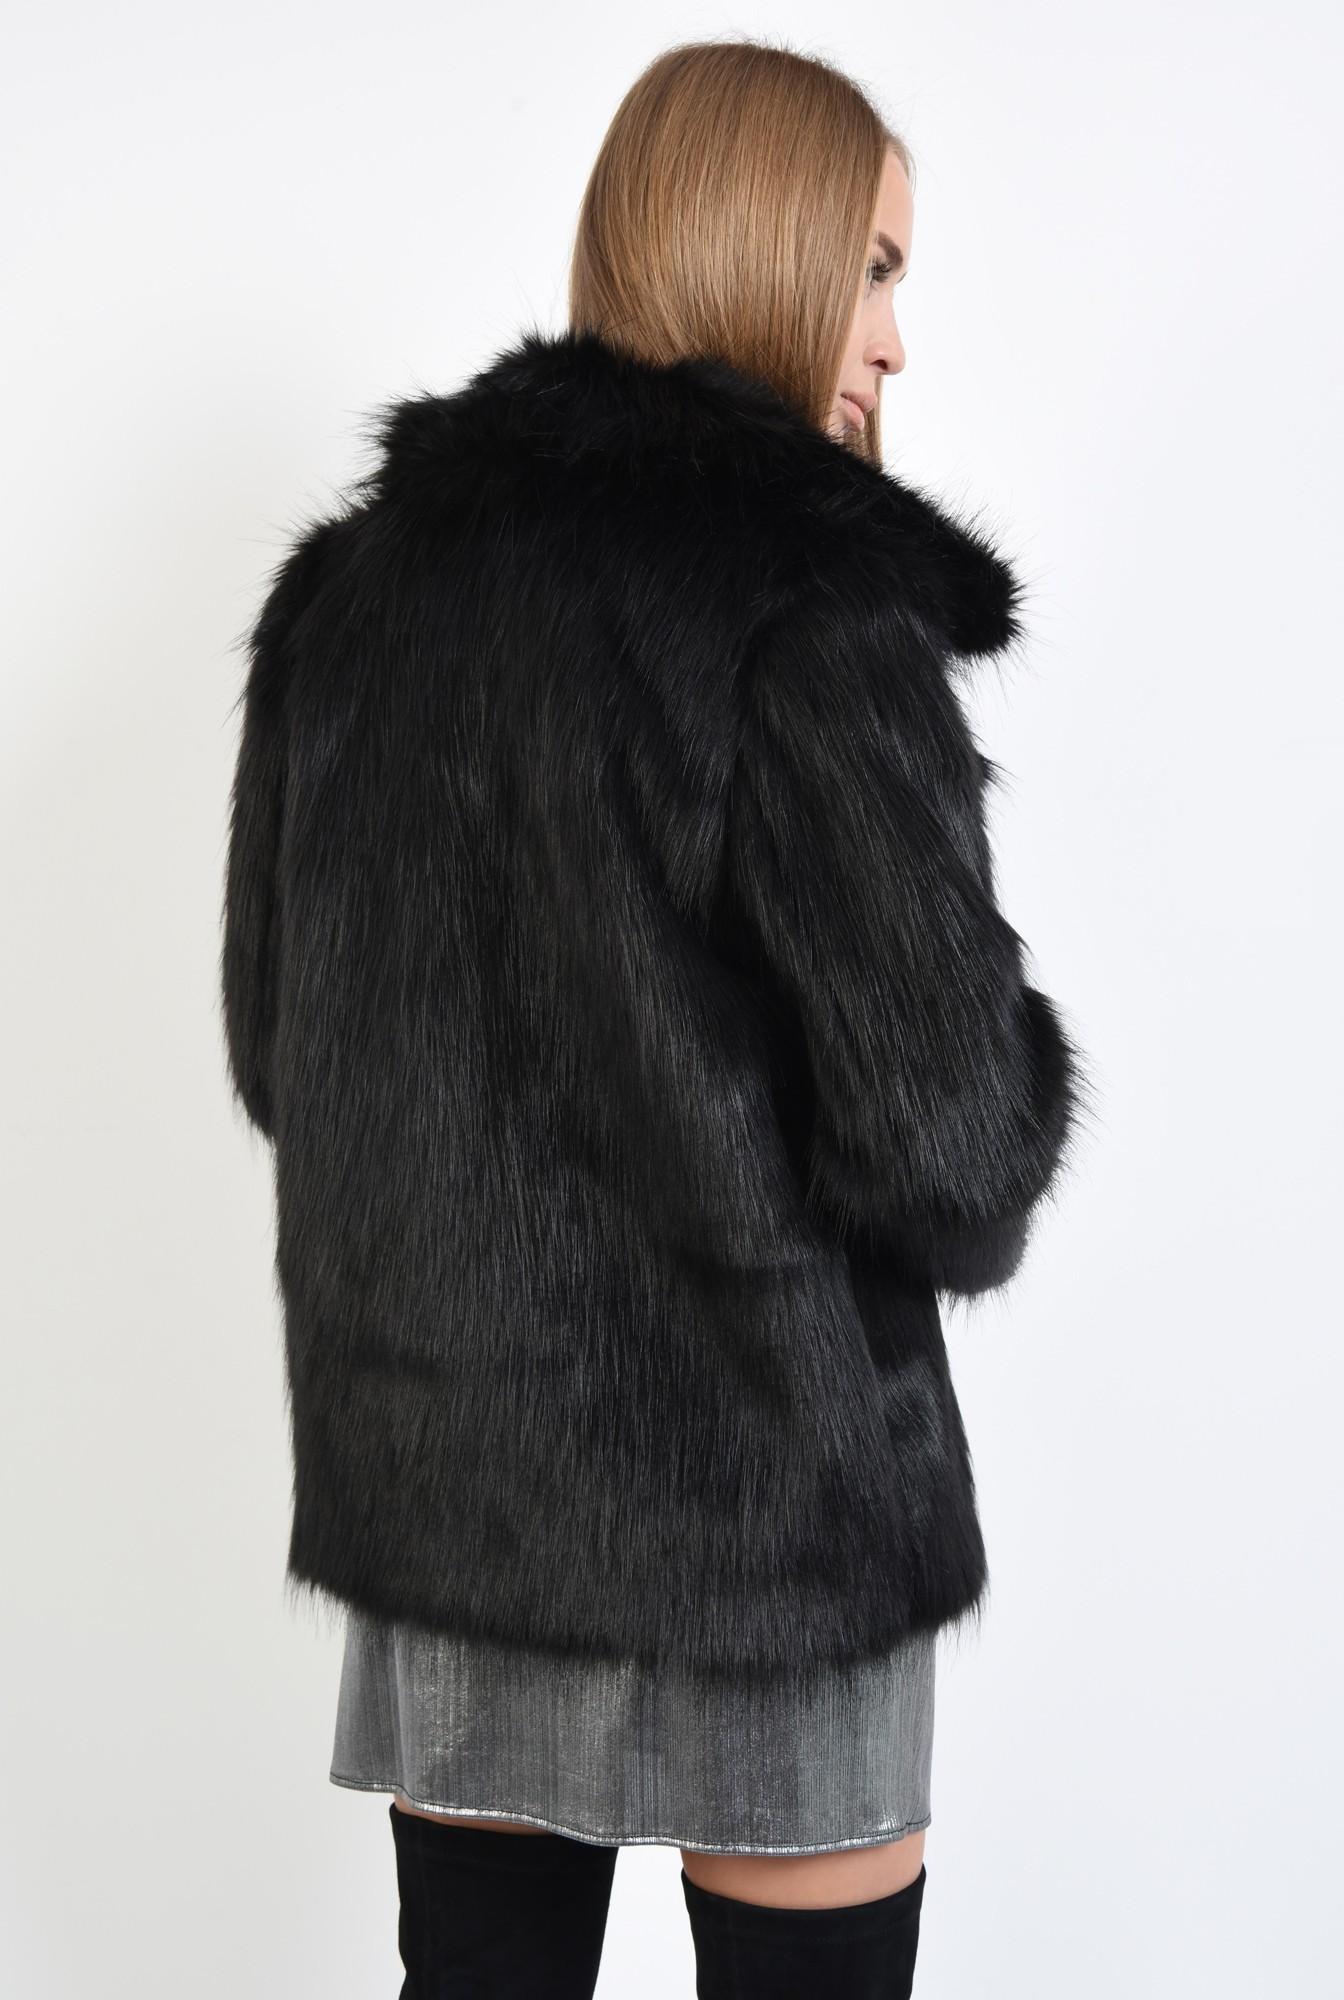 1 - jacheta din blana artificiala, croi drept, jacheta dama, haina blana online